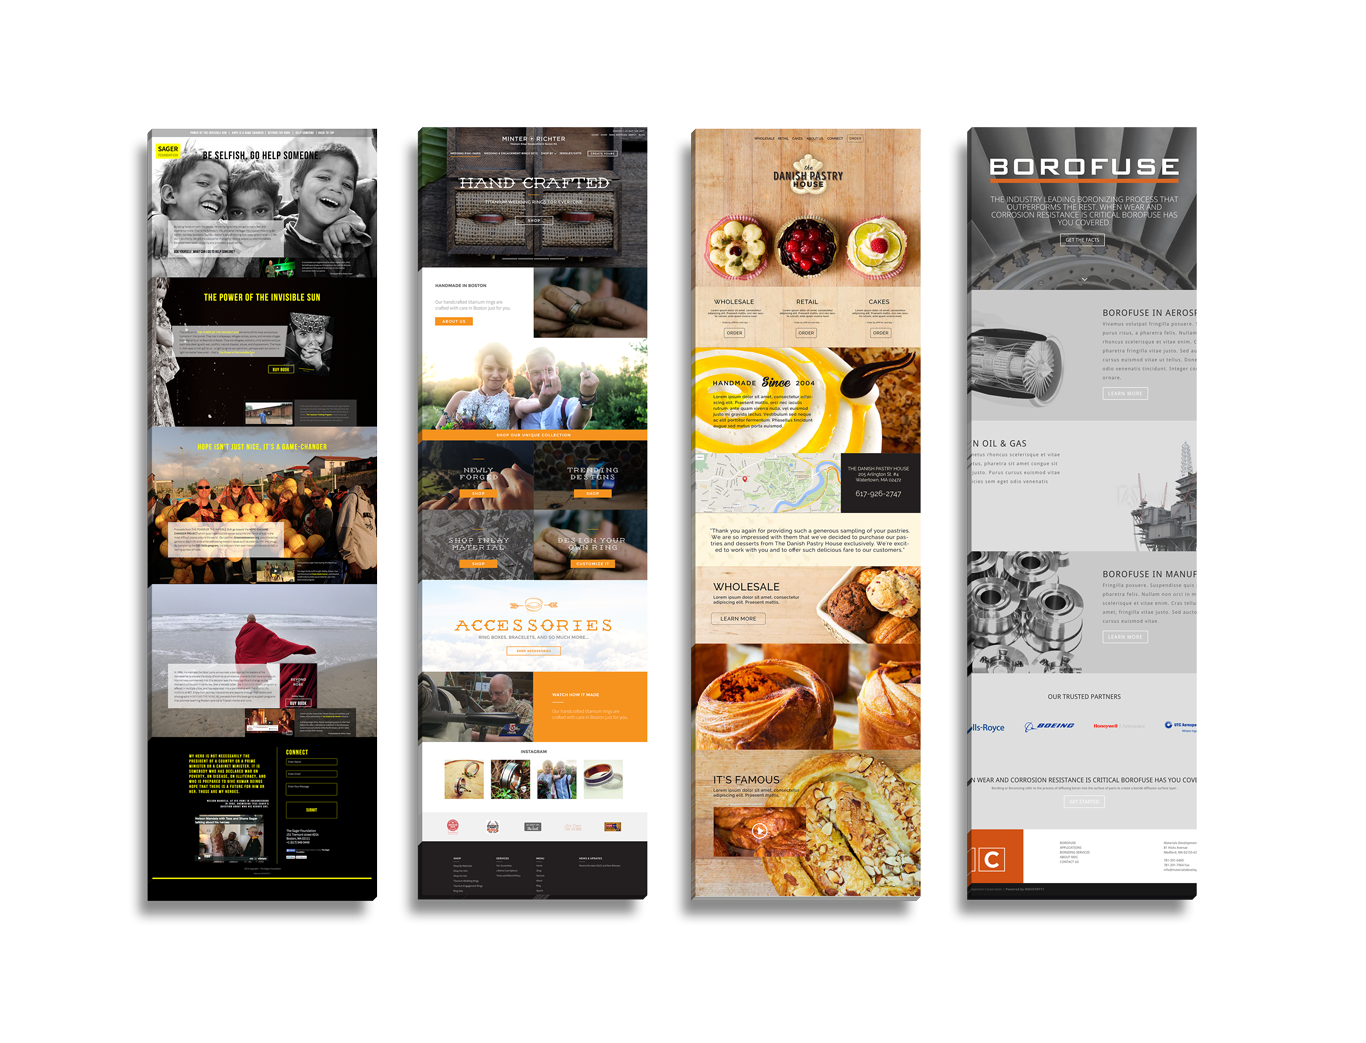 digital marketing company and Web Design Company portfolio image